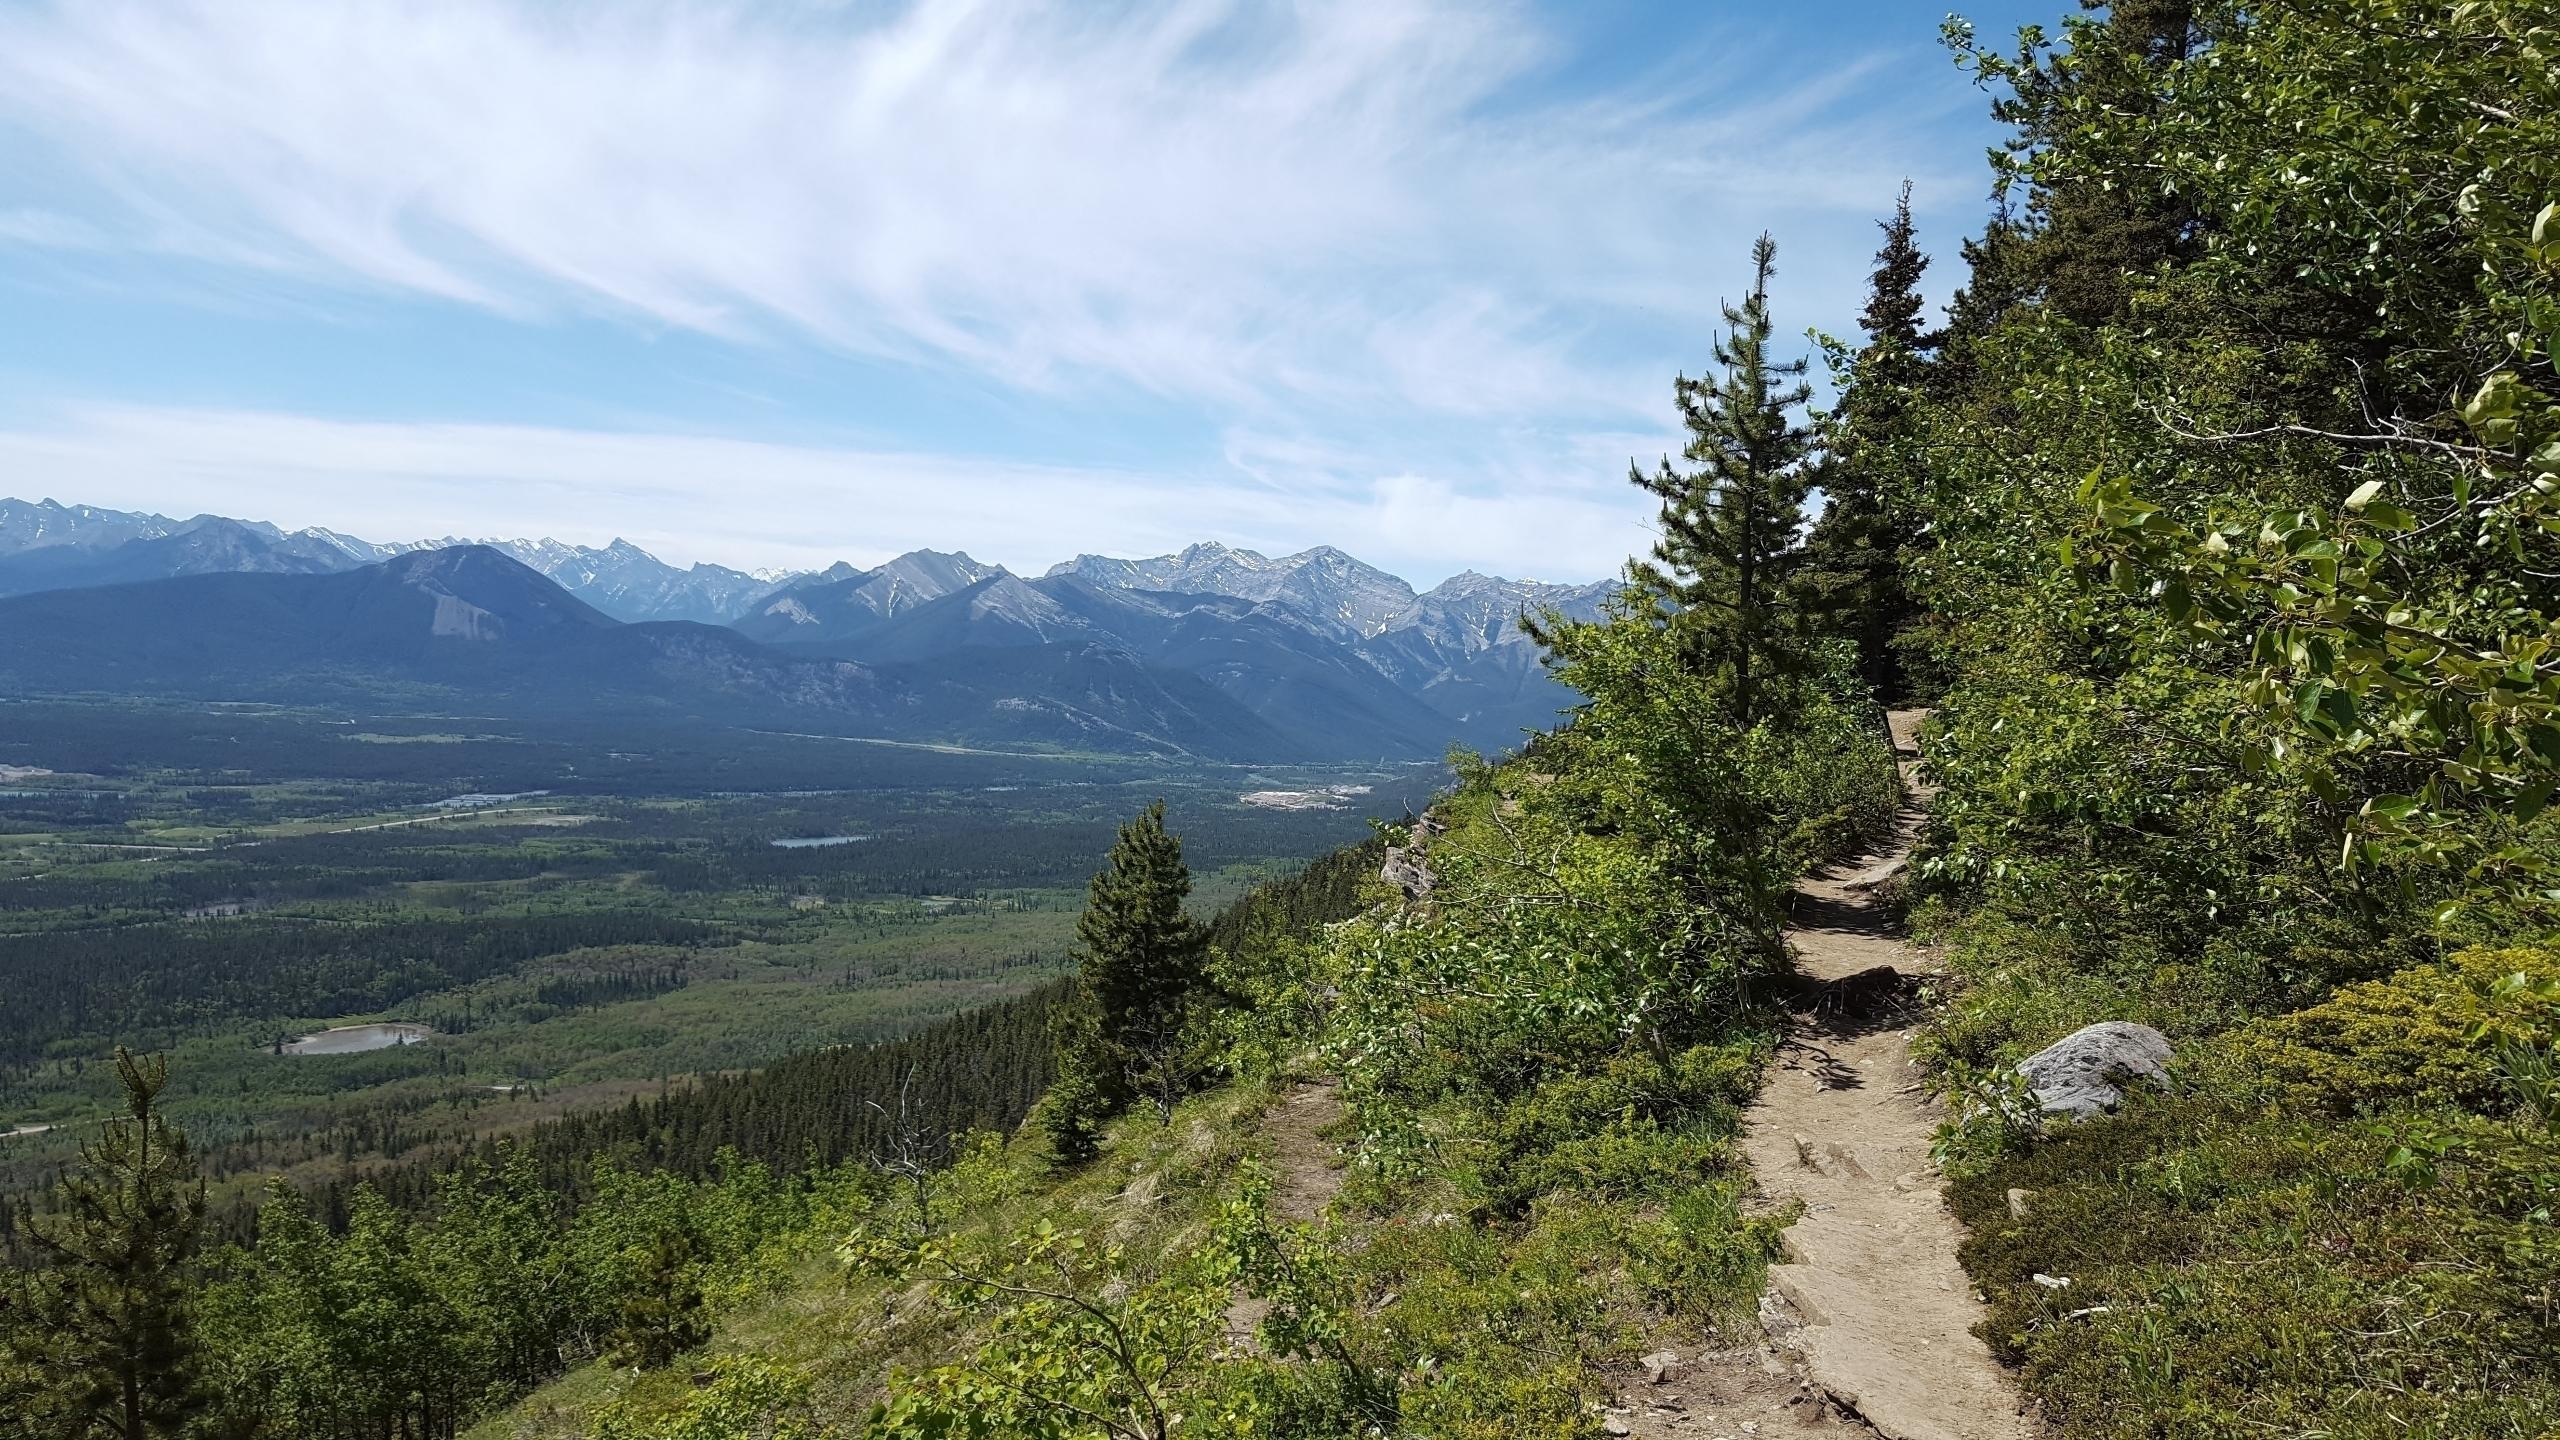 Rockies Mount Yamnuska June 201 - camwmclean | ello